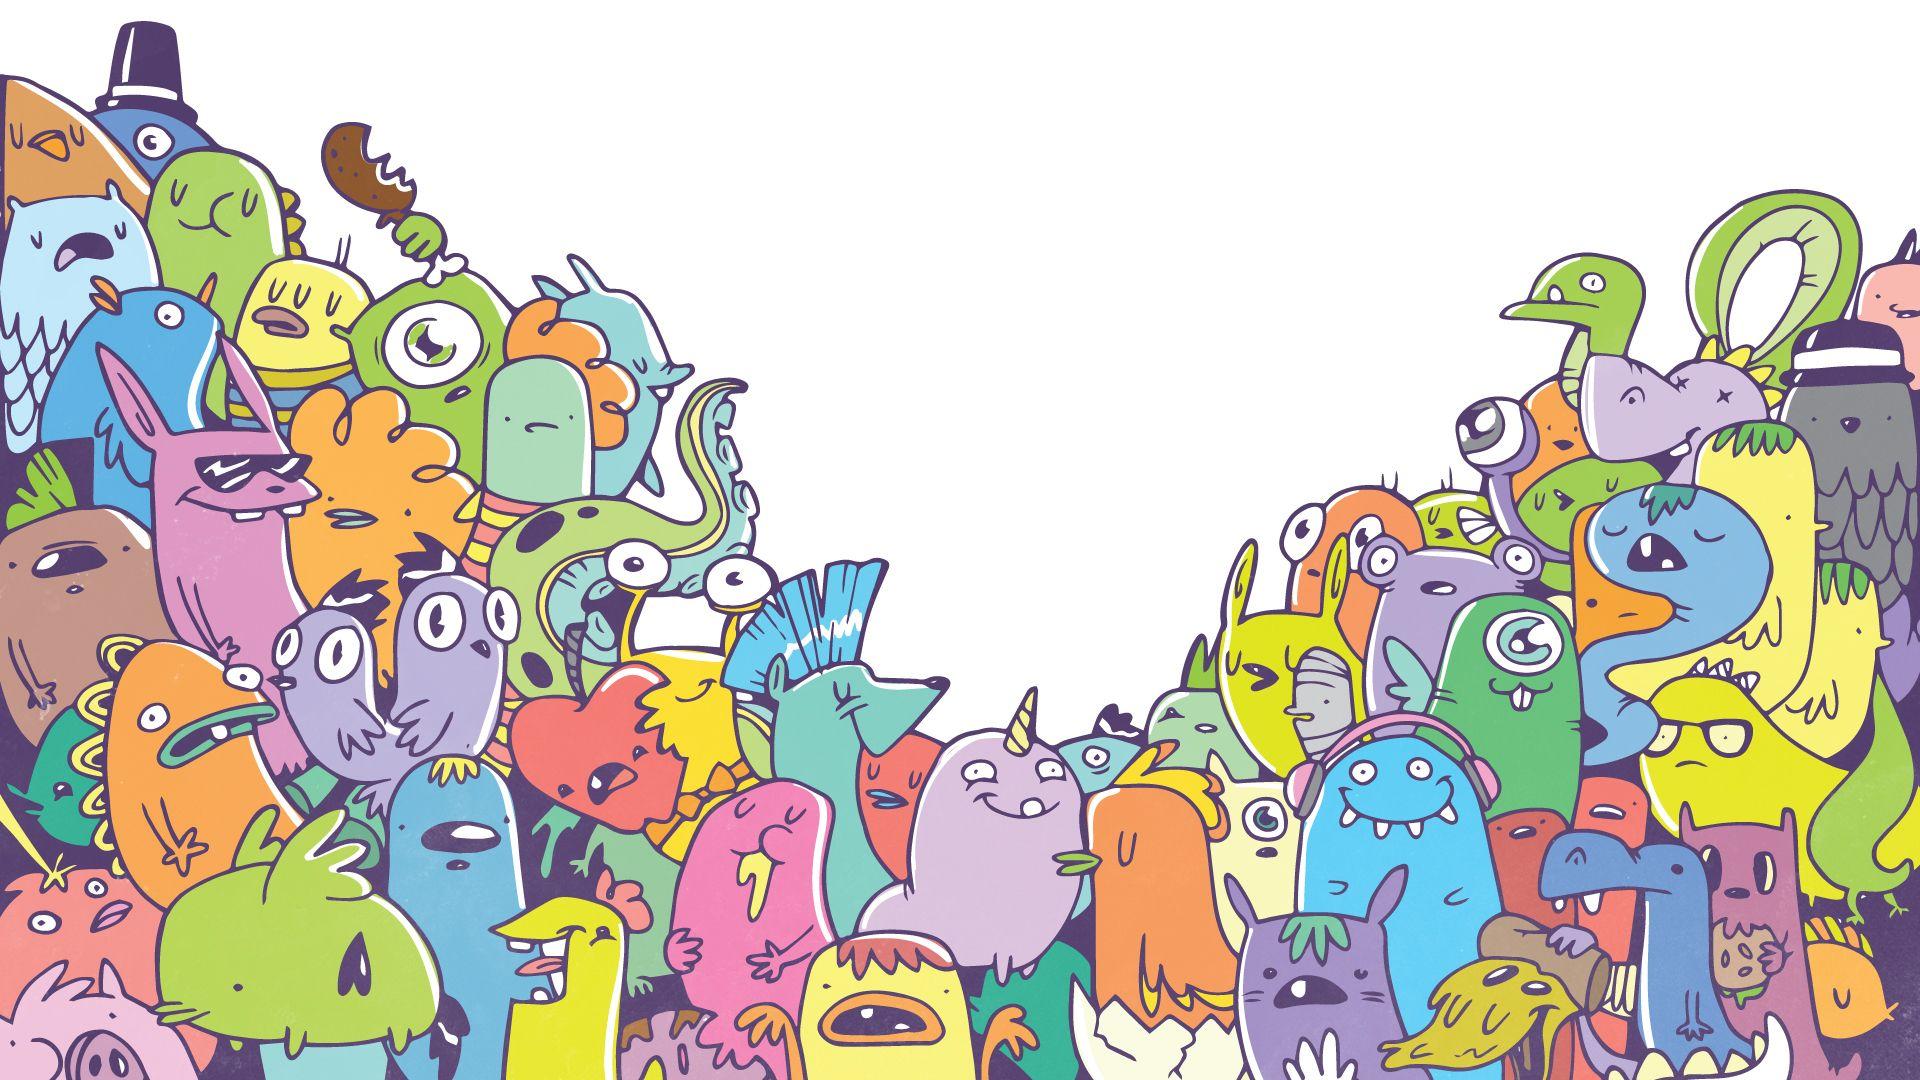 Doodle Wallpaper For Iphone | Гриффонаж, Обои искусство ...